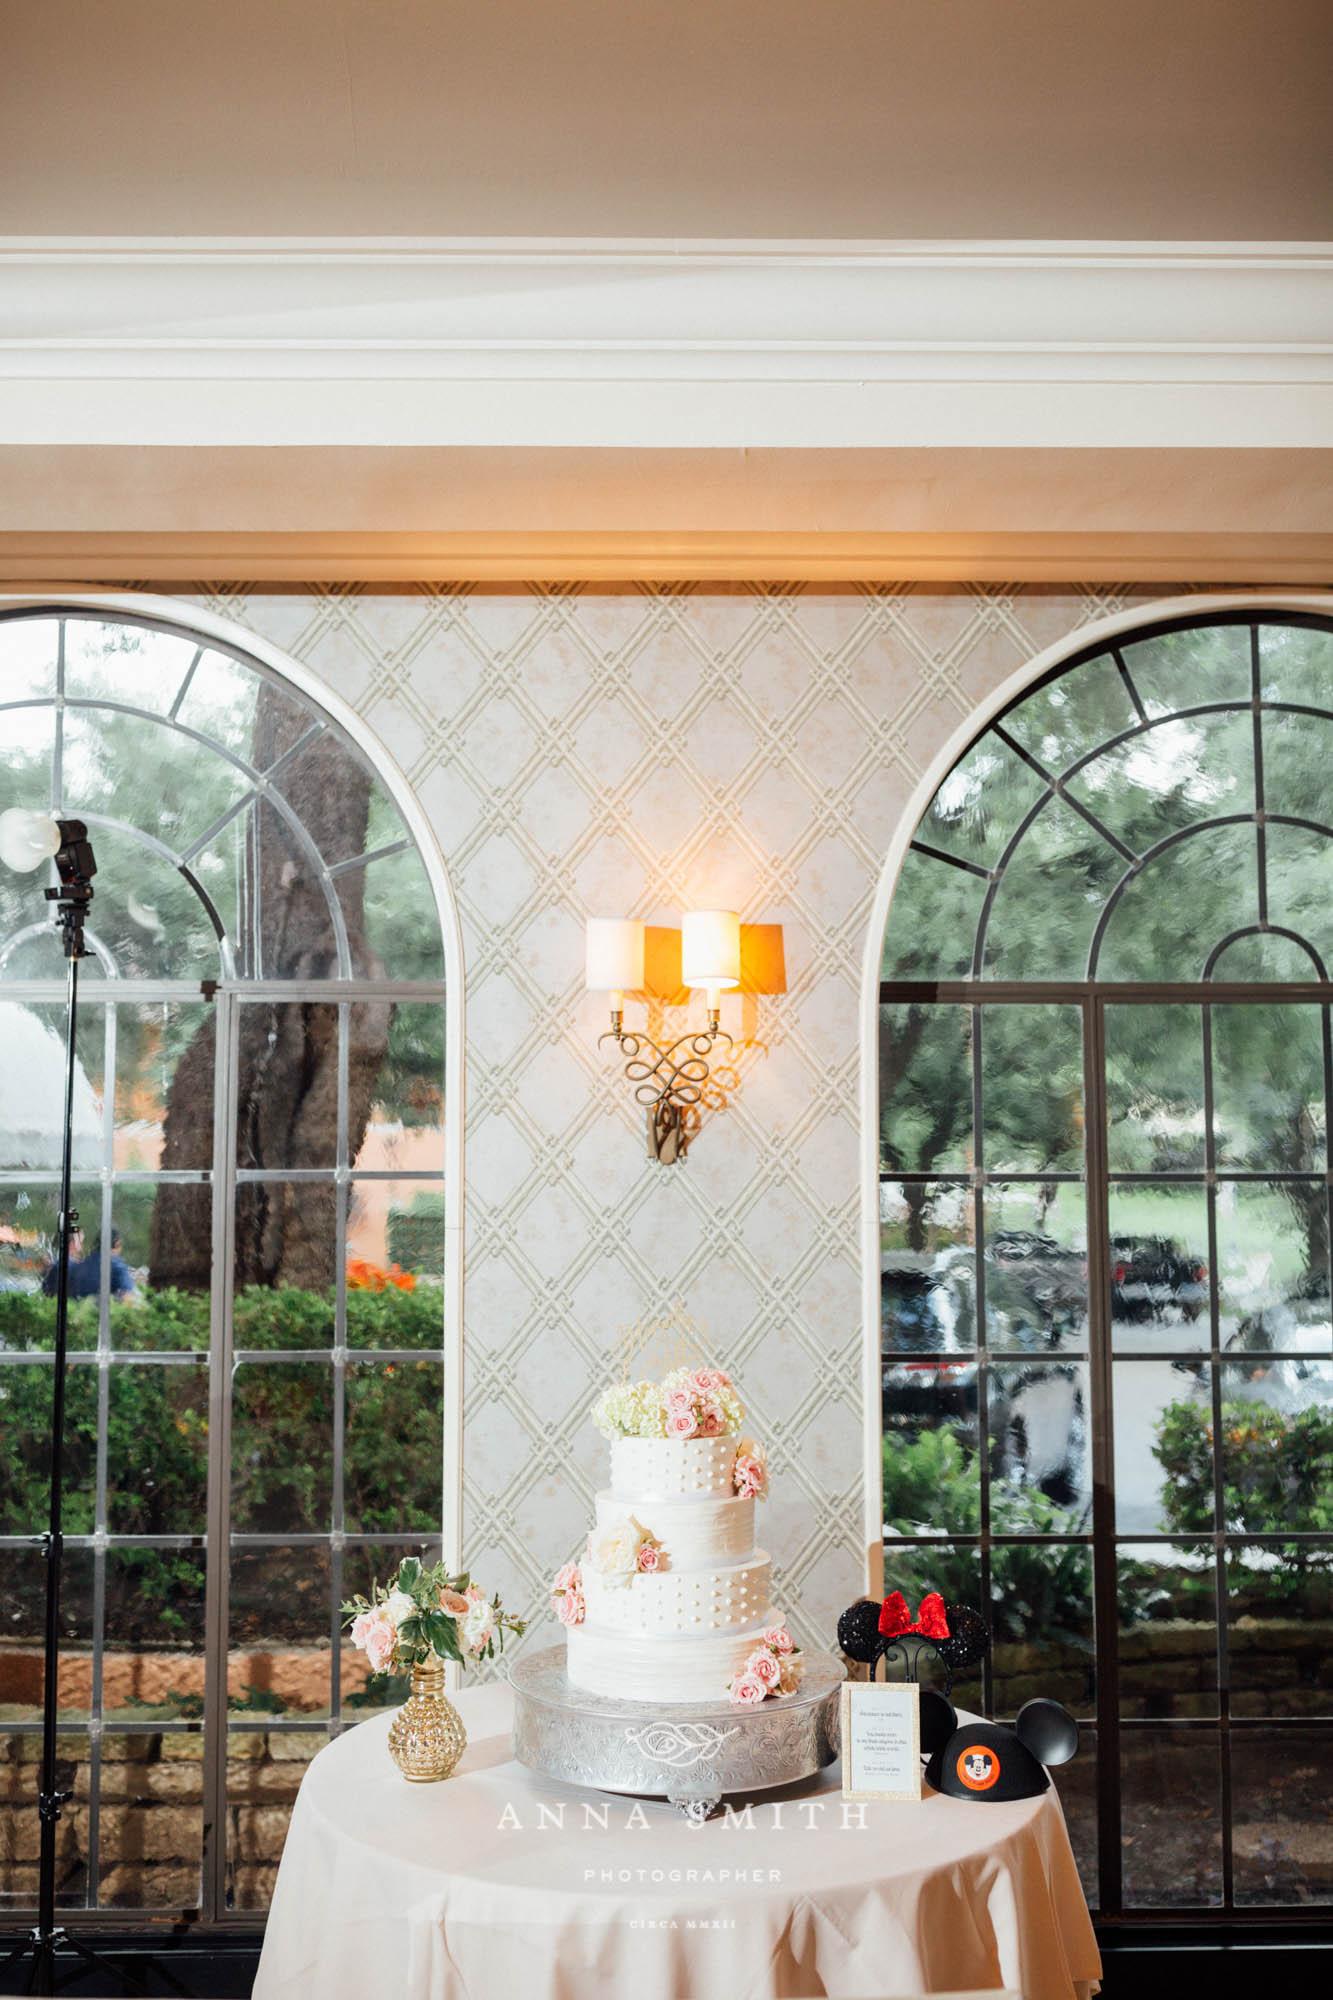 WEB 2016-6-W-CD-courtney brett the mansion on turtle creek wedding anna smith photography  (639 of 879).jpg